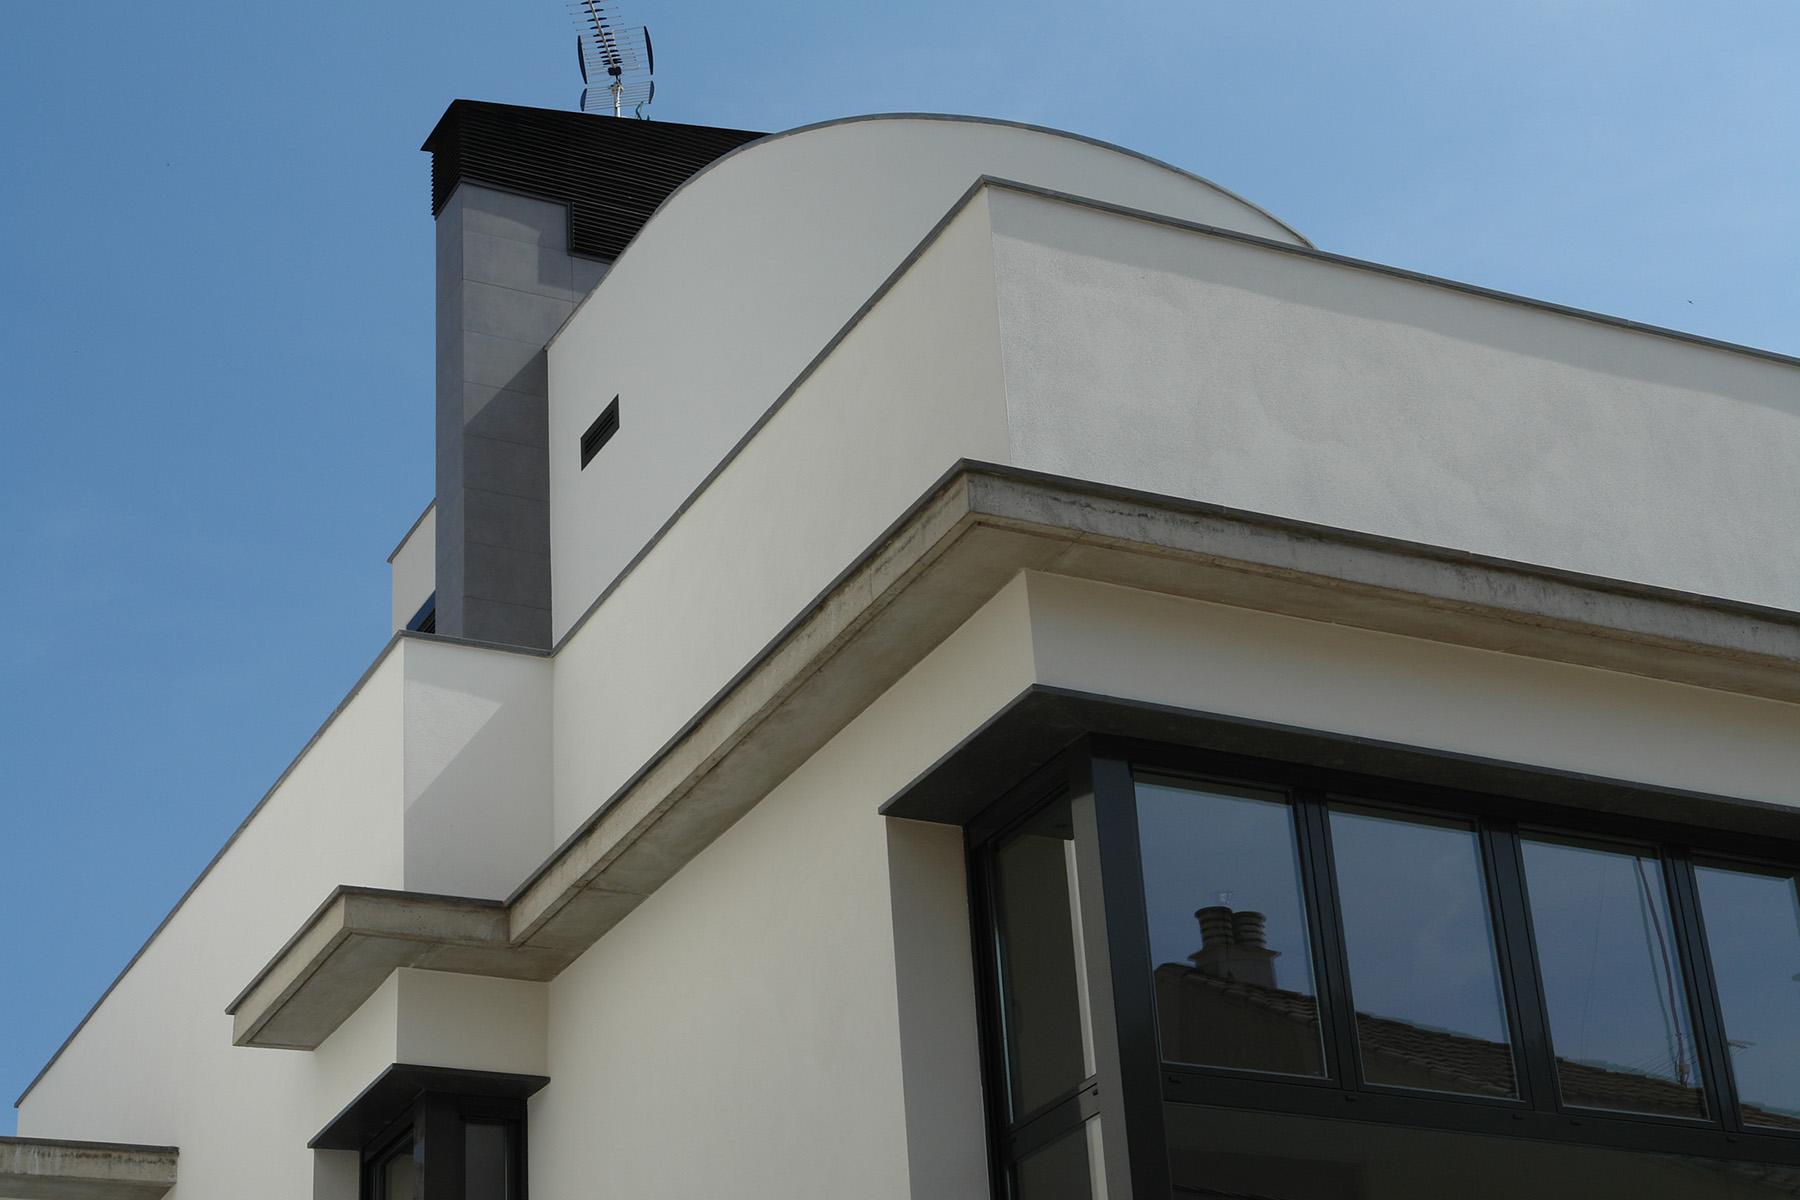 Galeria Casa en Binéfar, Huesca - 9 ?>